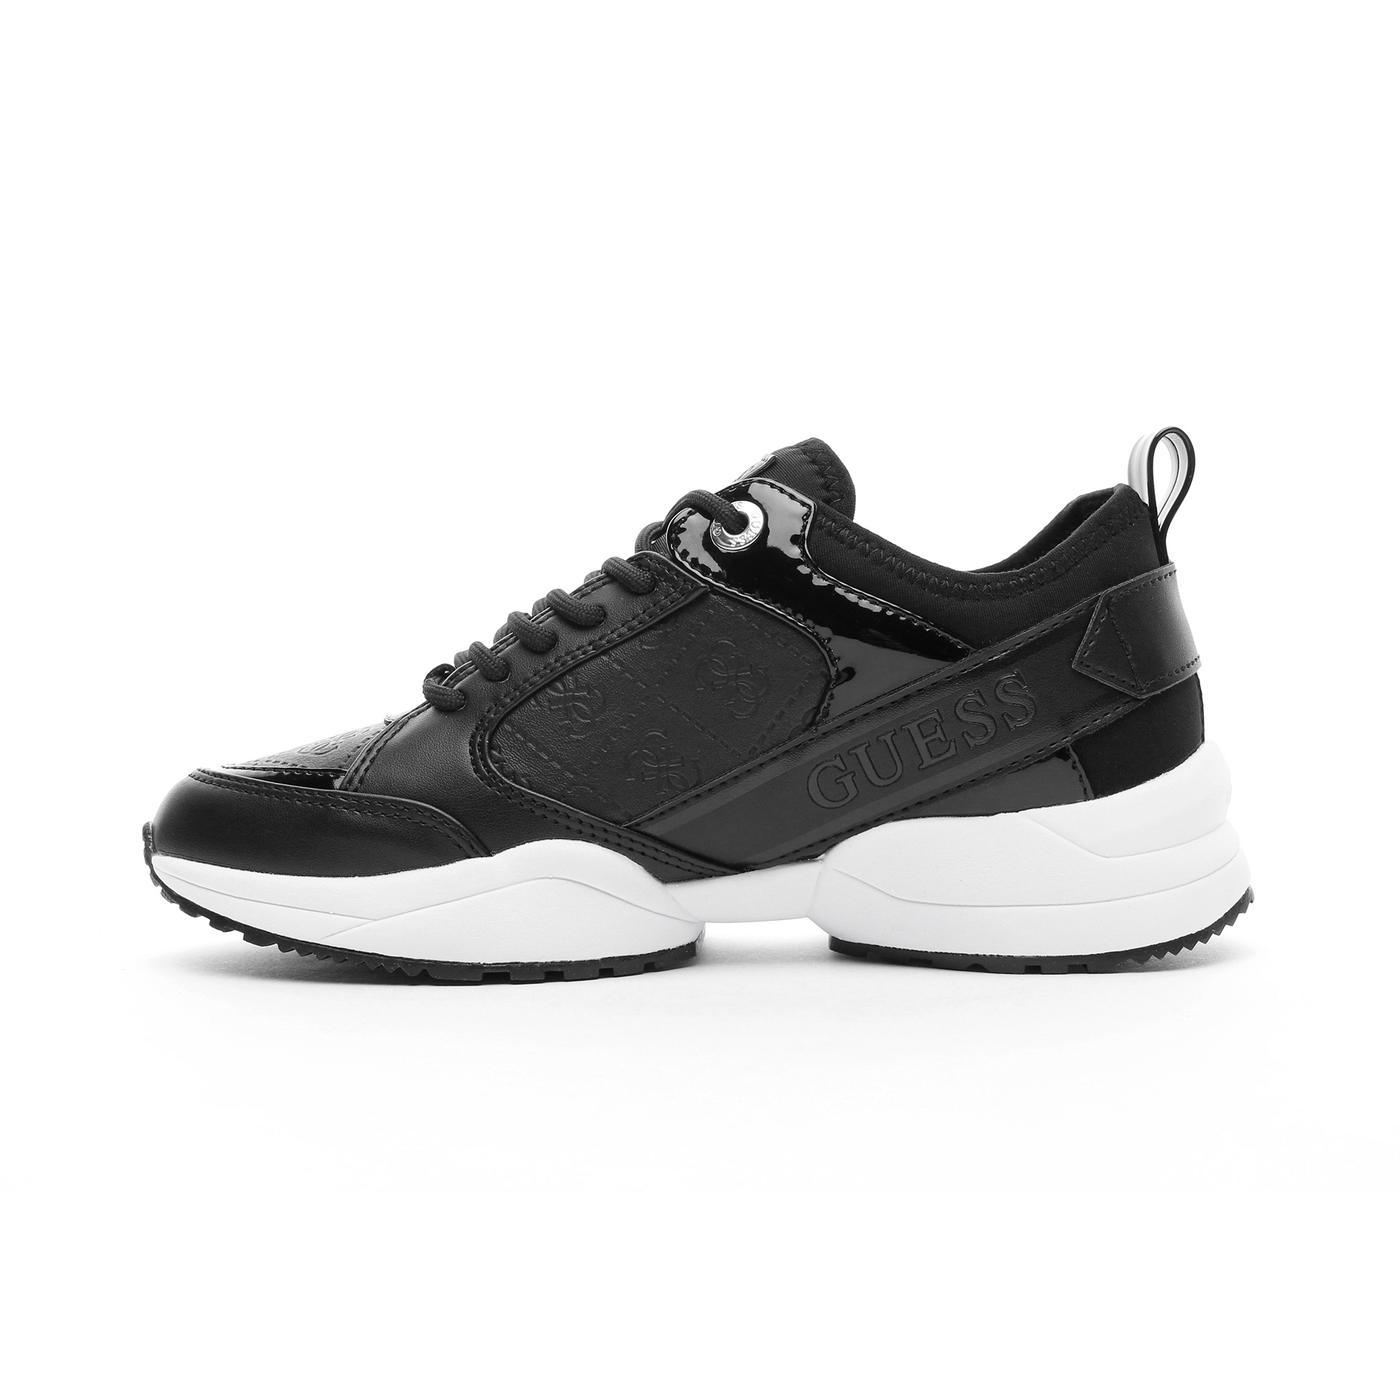 Guess Breeta Kadın Siyah Spor Ayakkabı